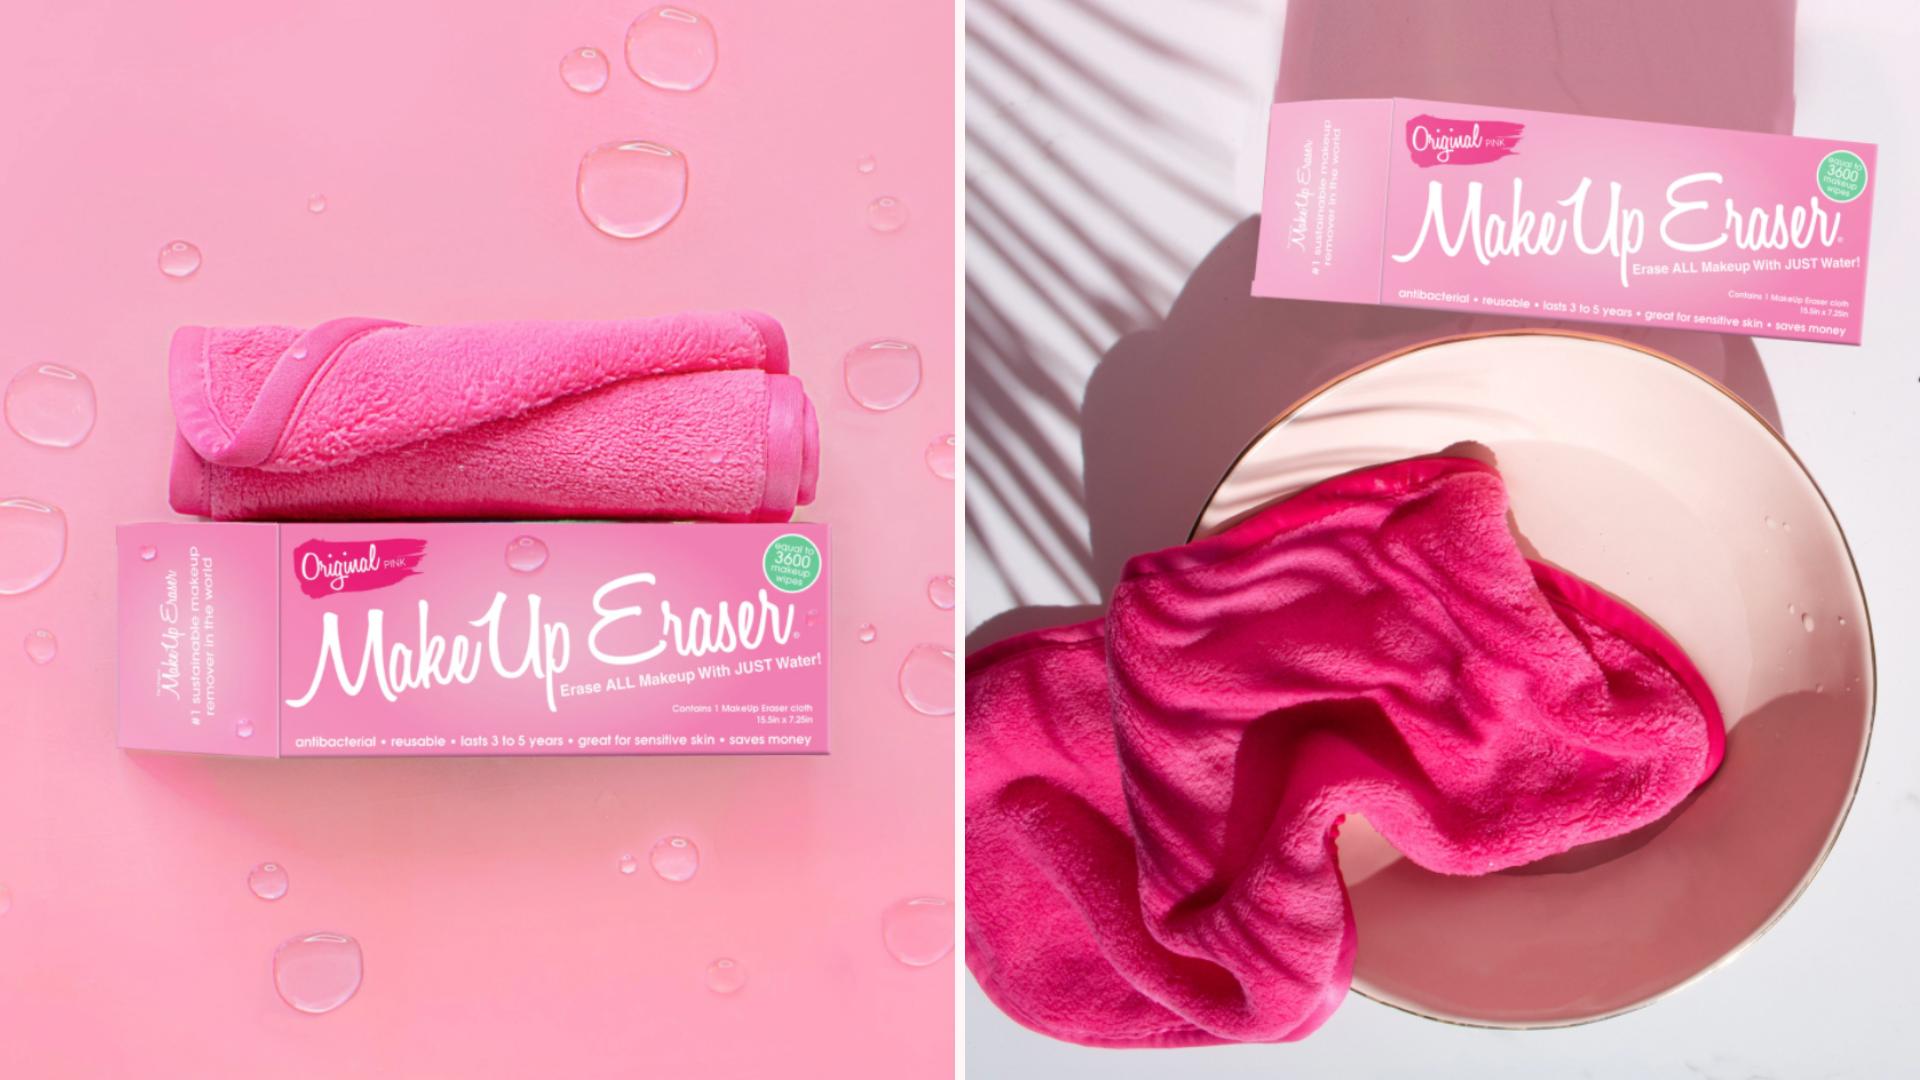 two images of pink makeup eraser cloth